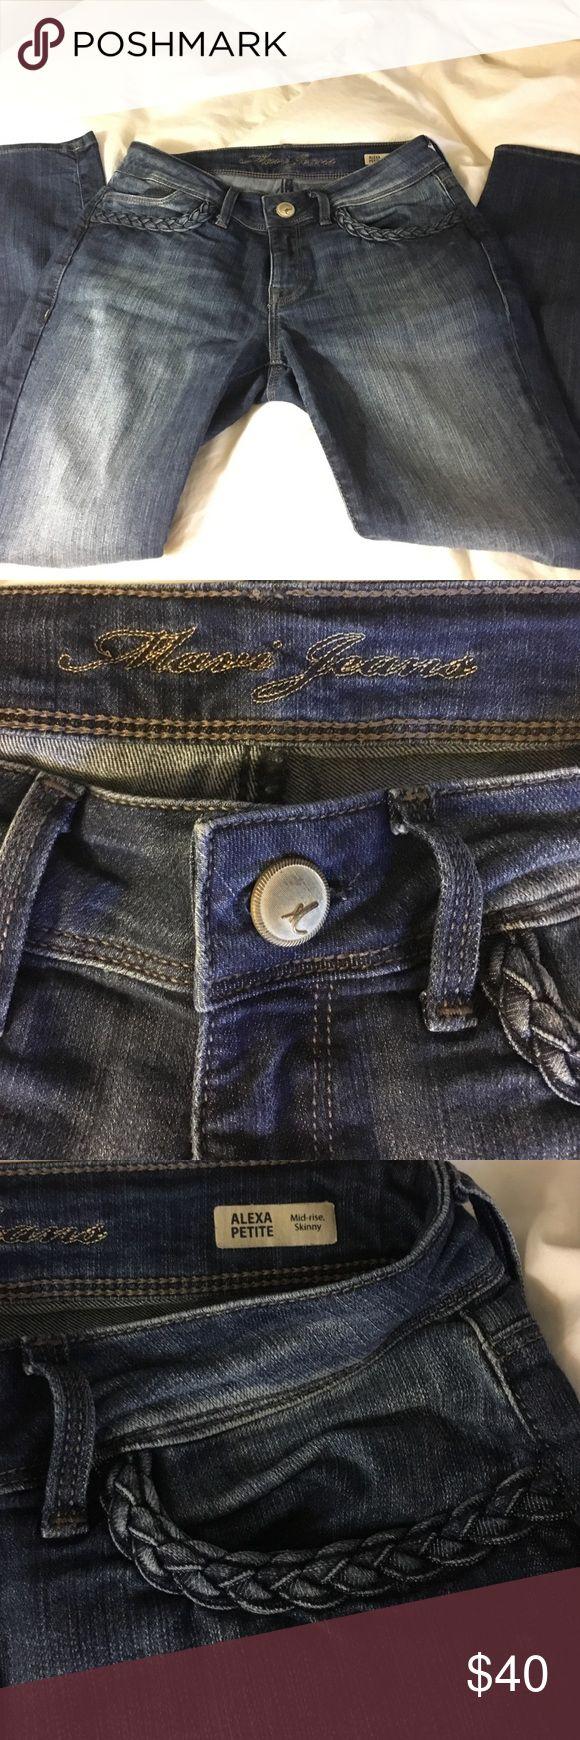 PRICE DROP ⬇️⬇️⬇️ Mavi Skinny jeans Mavi dark blue skinny jeans from Stitch Fix Mavi Jeans Skinny